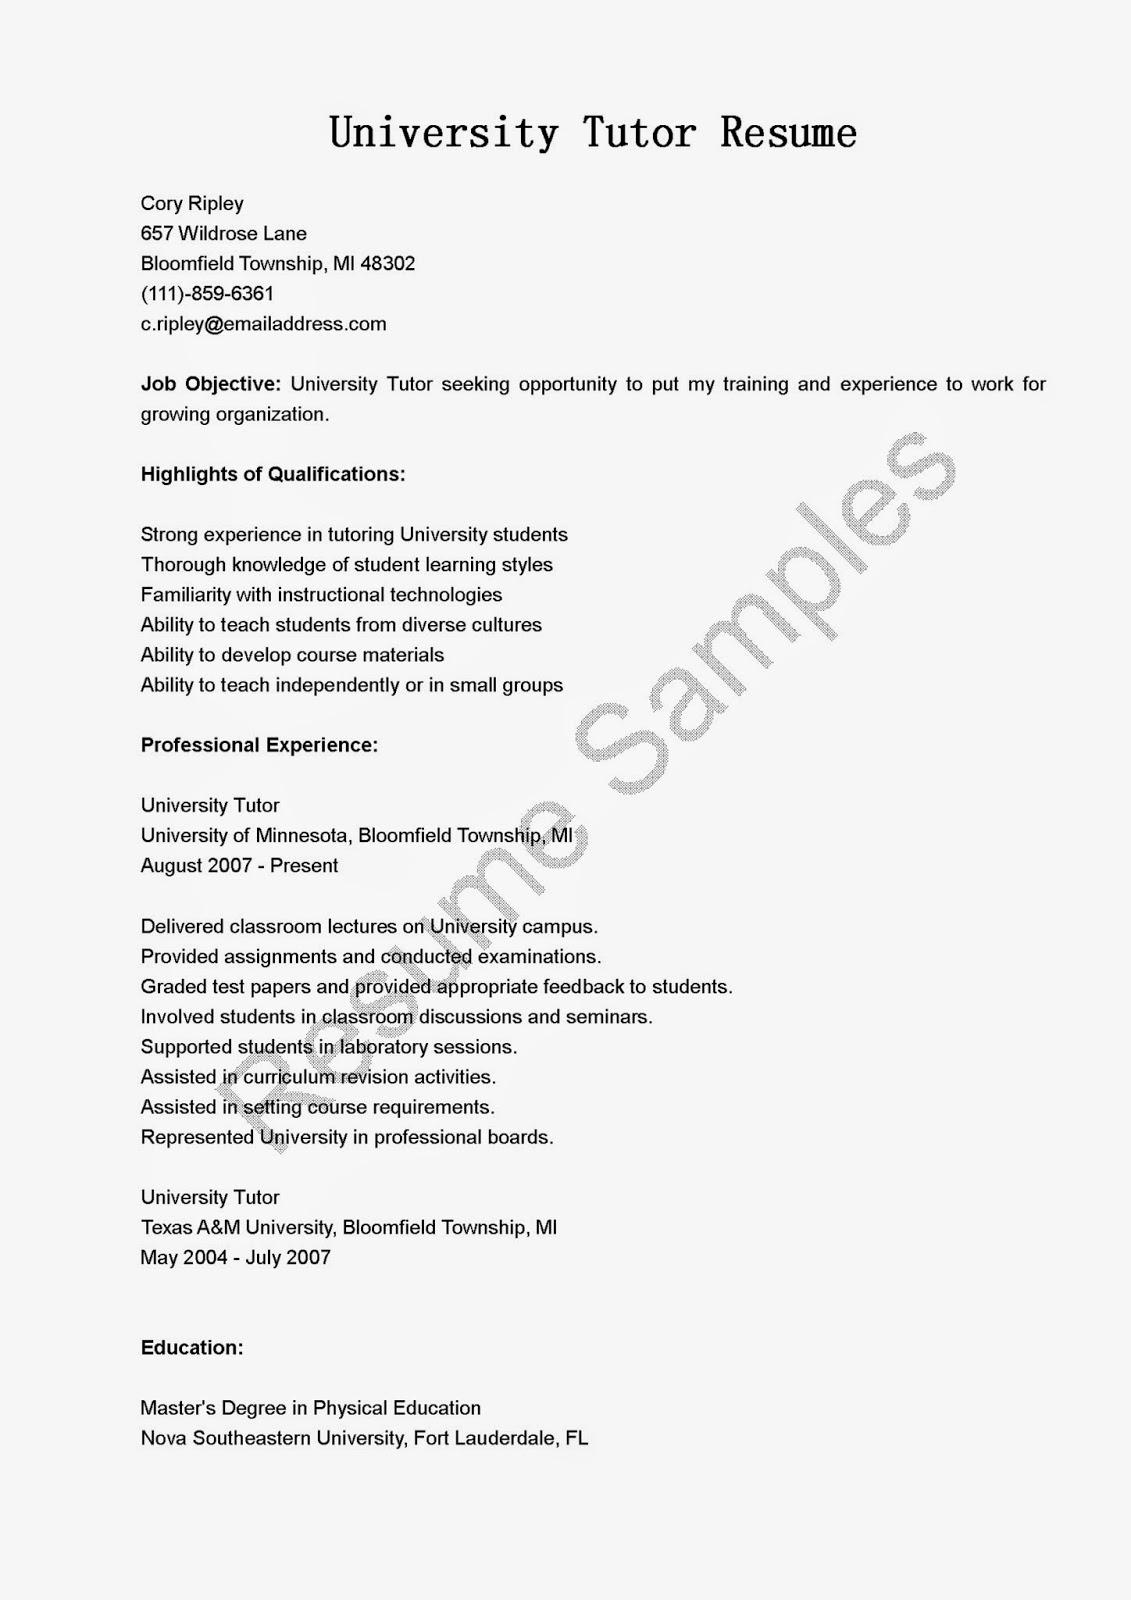 Resume Samples University Tutor Resume Sample